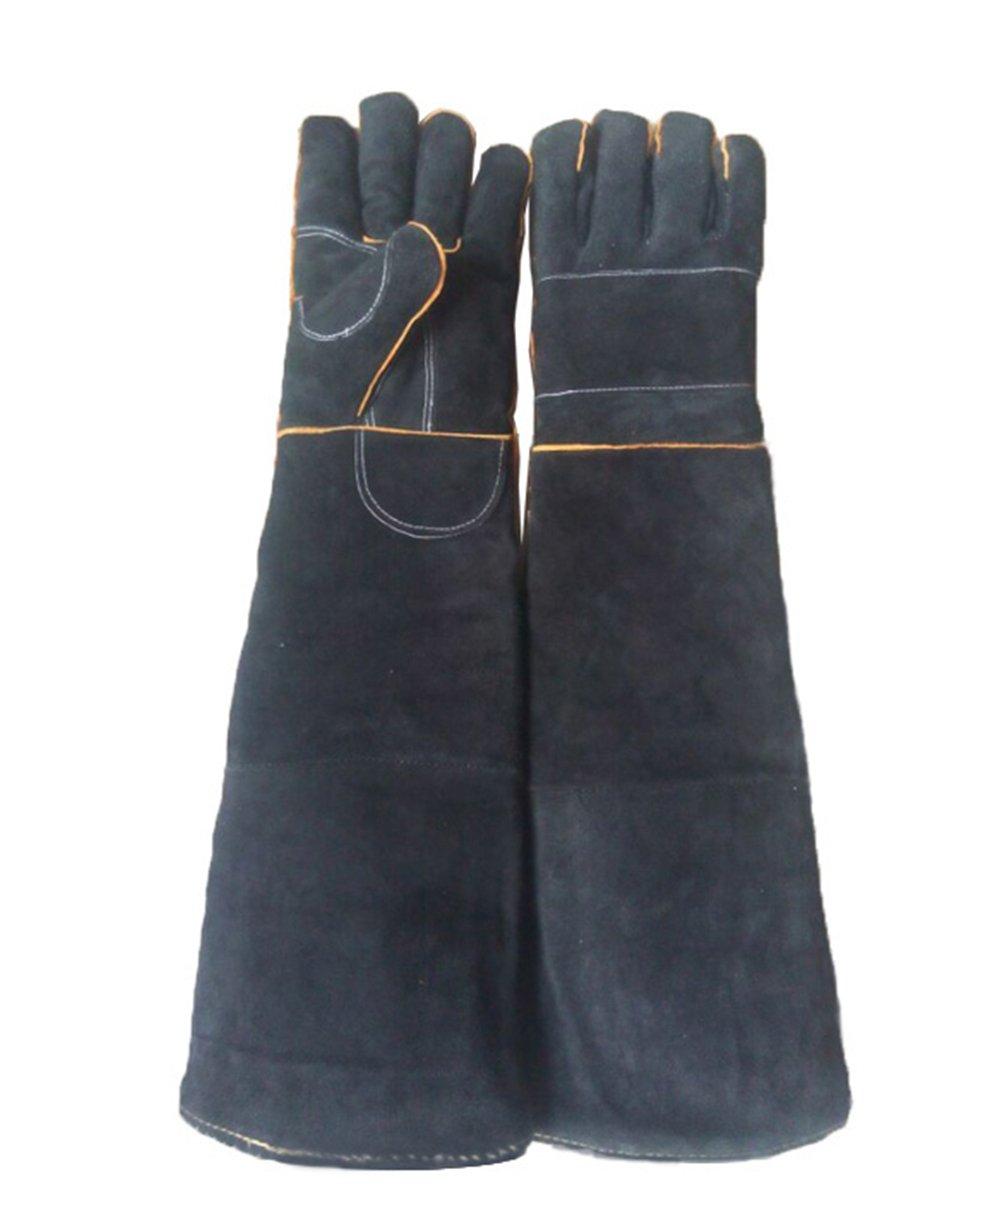 Animals Protection Gloves, Thickened Animal Handling Anti-Bite/Scratch Gloves For Dog Cat Bird Snake Parrot Lizard Anti-Biting Gauntlet, Black 94221